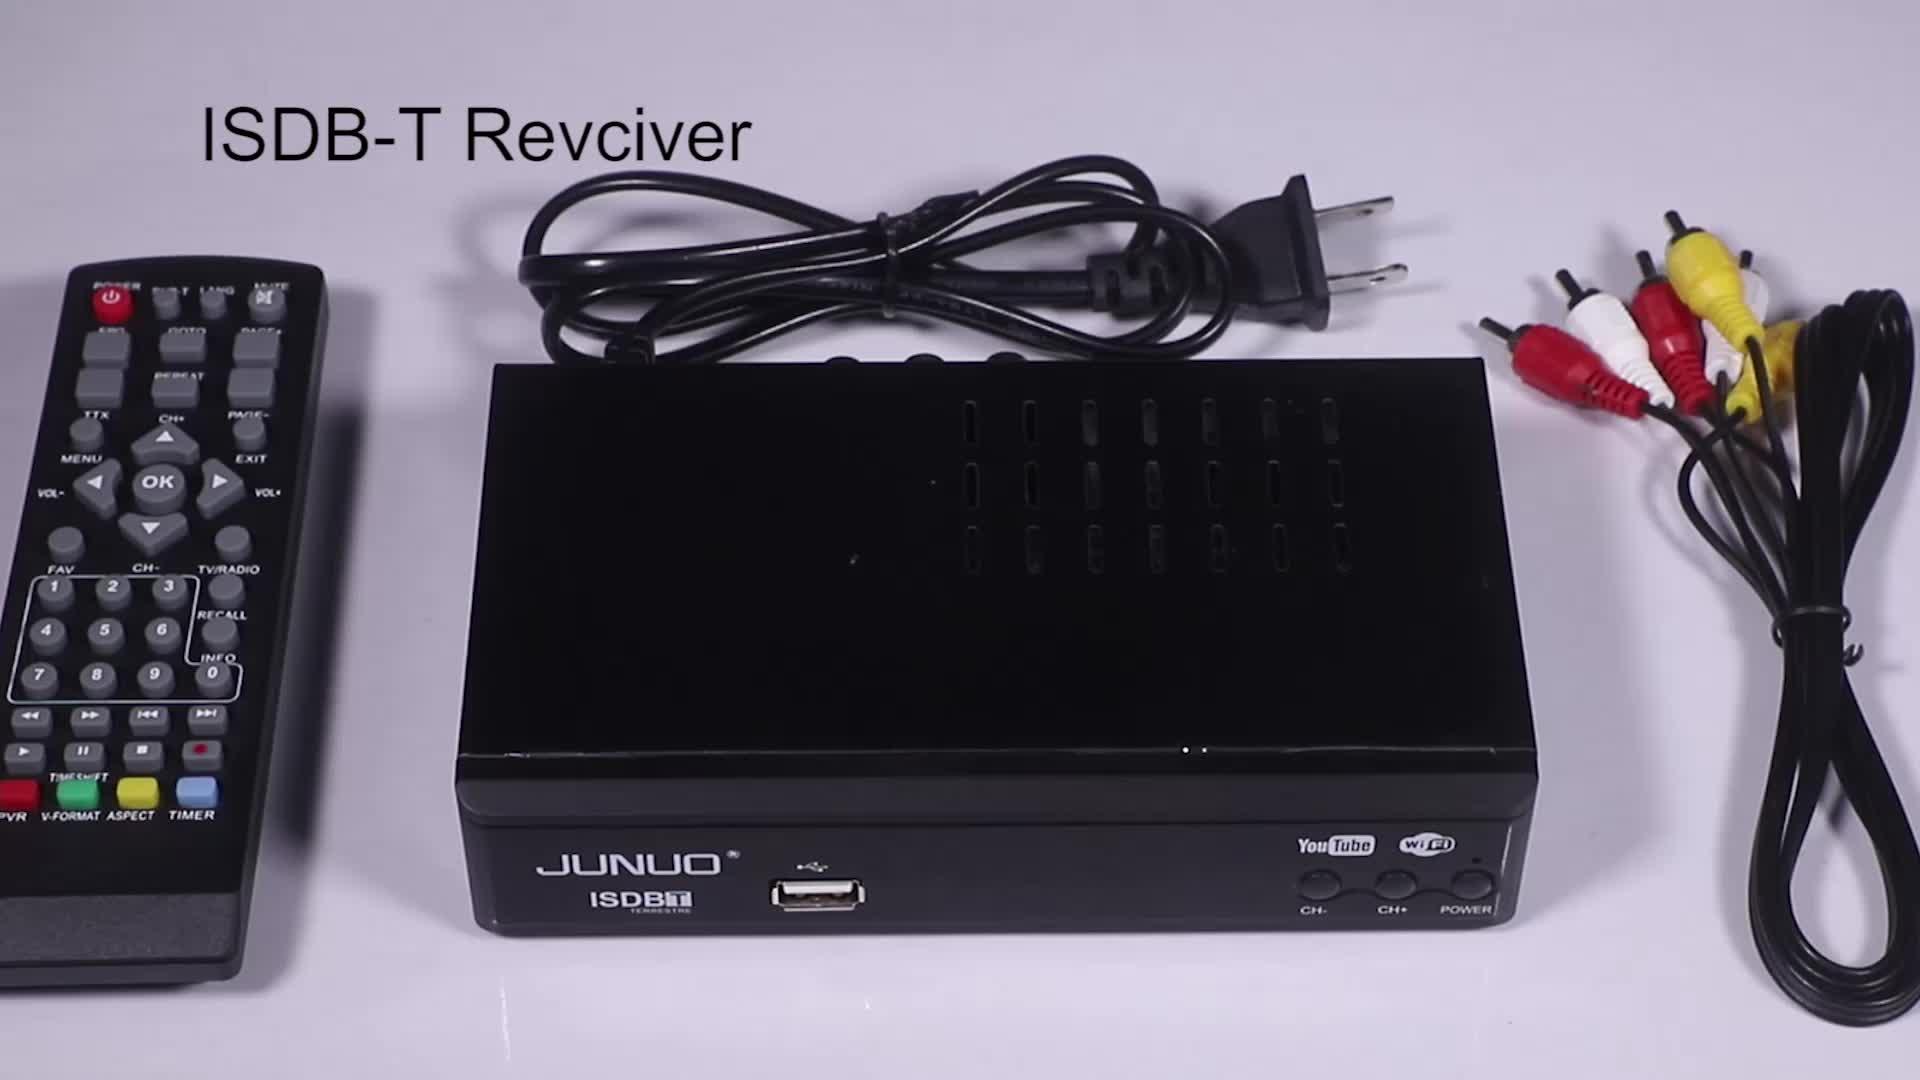 JUNUO STB factory free to air digital hd receiver 1080p set top box full HD ISDB-T